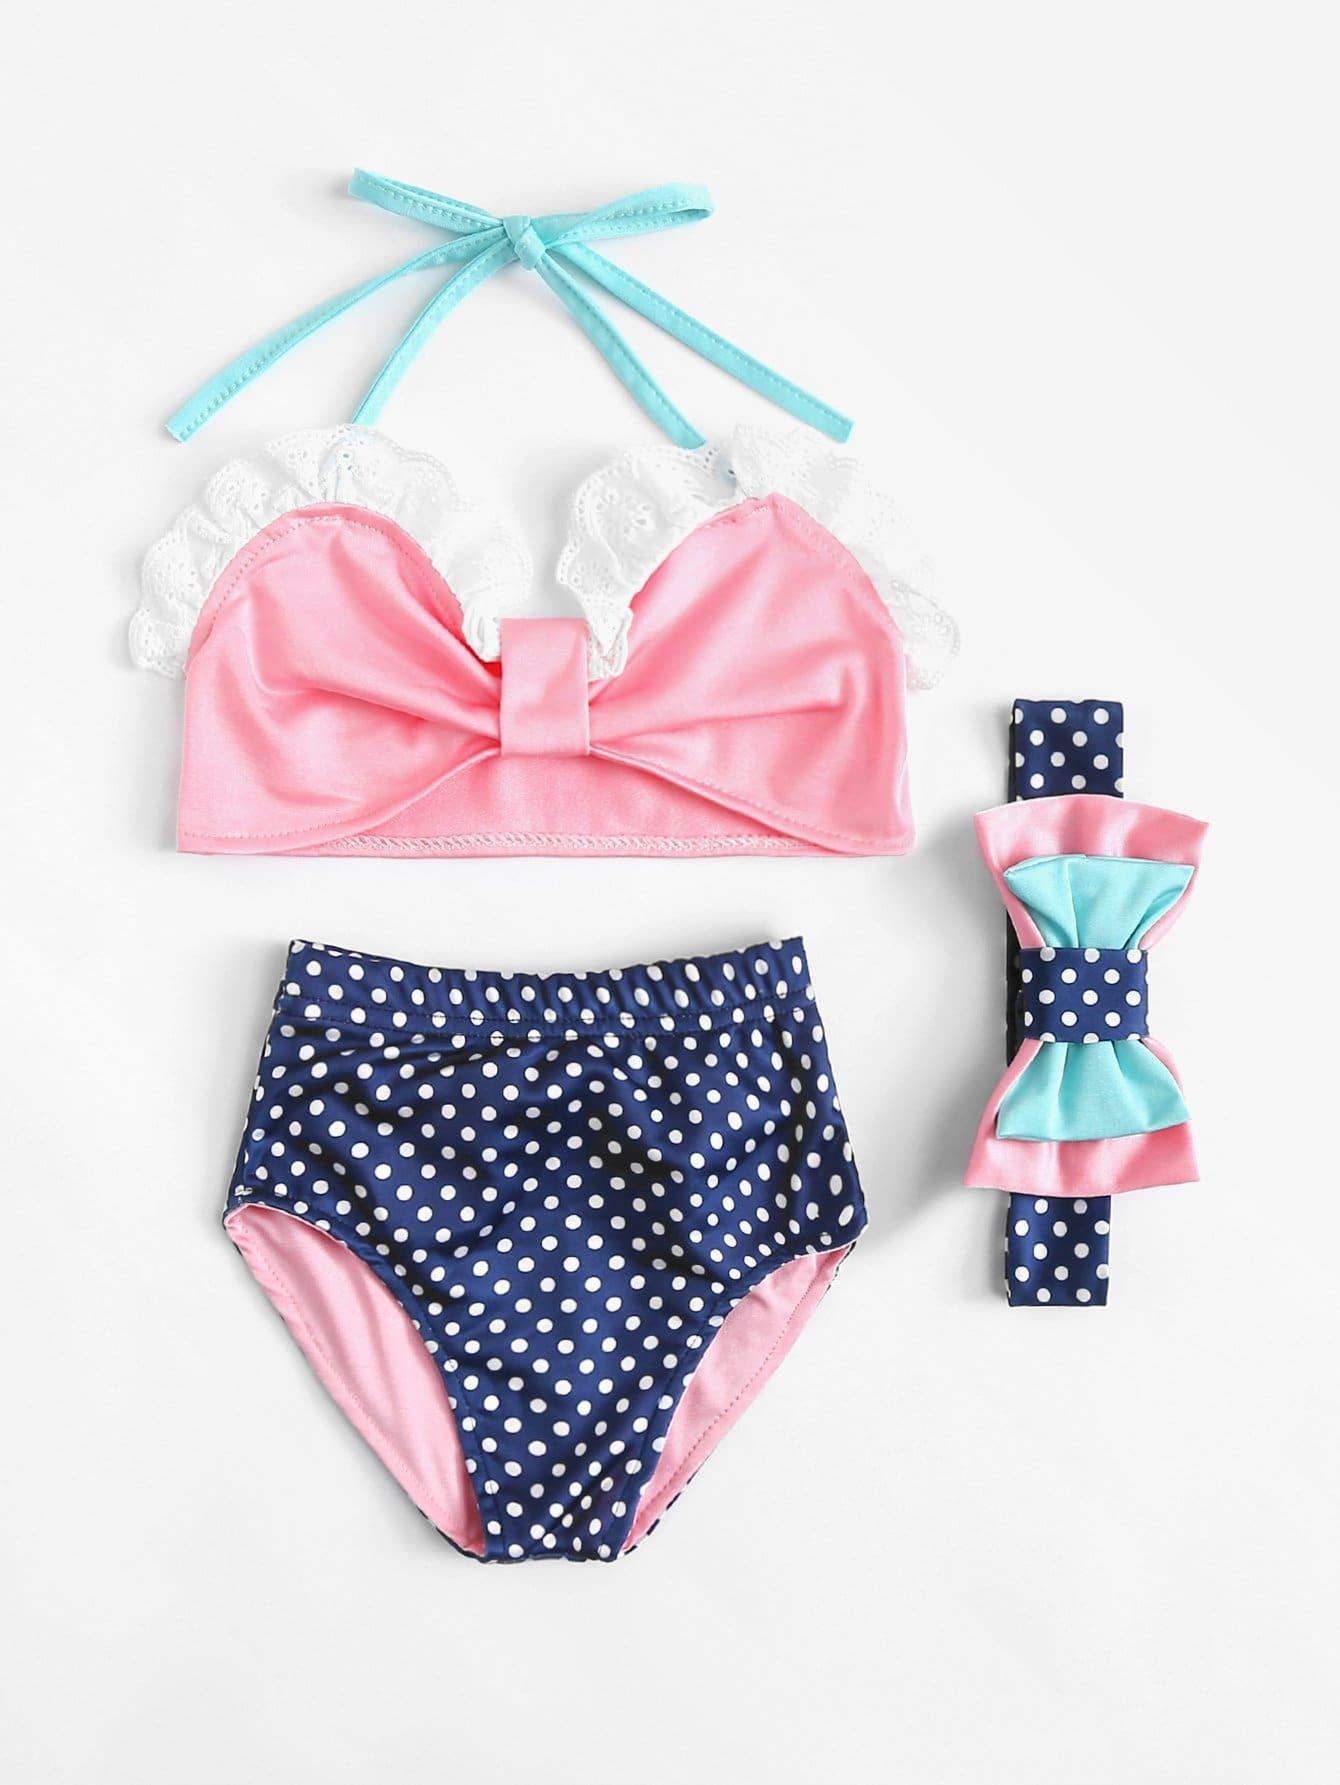 Girls Polka Dot Bow Bikini Set With Headband 10pcs fashion girls hair band polka dot bow rabbit ears elastic hair rubber ponytail holder hair accessories for women headband